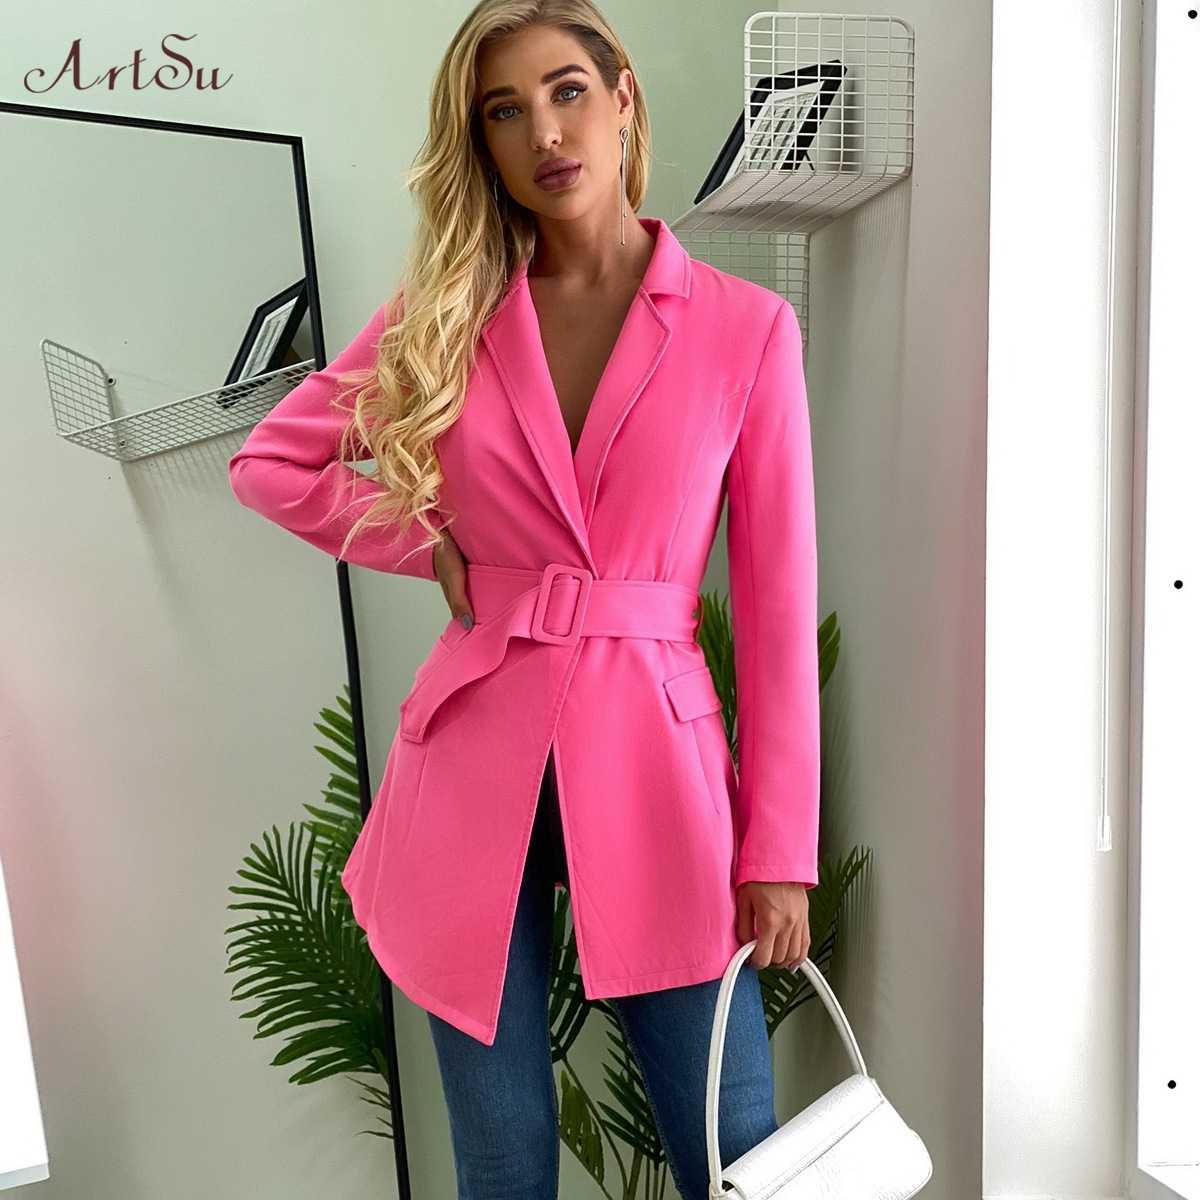 ArtSu עמוק V צוואר ארוך טרייל שמלת 2020 ורוד תלבושות Slim מותניים חליפת שמלת נשים ארוך שרוול מיני שמלות Femme גלימה חדשה